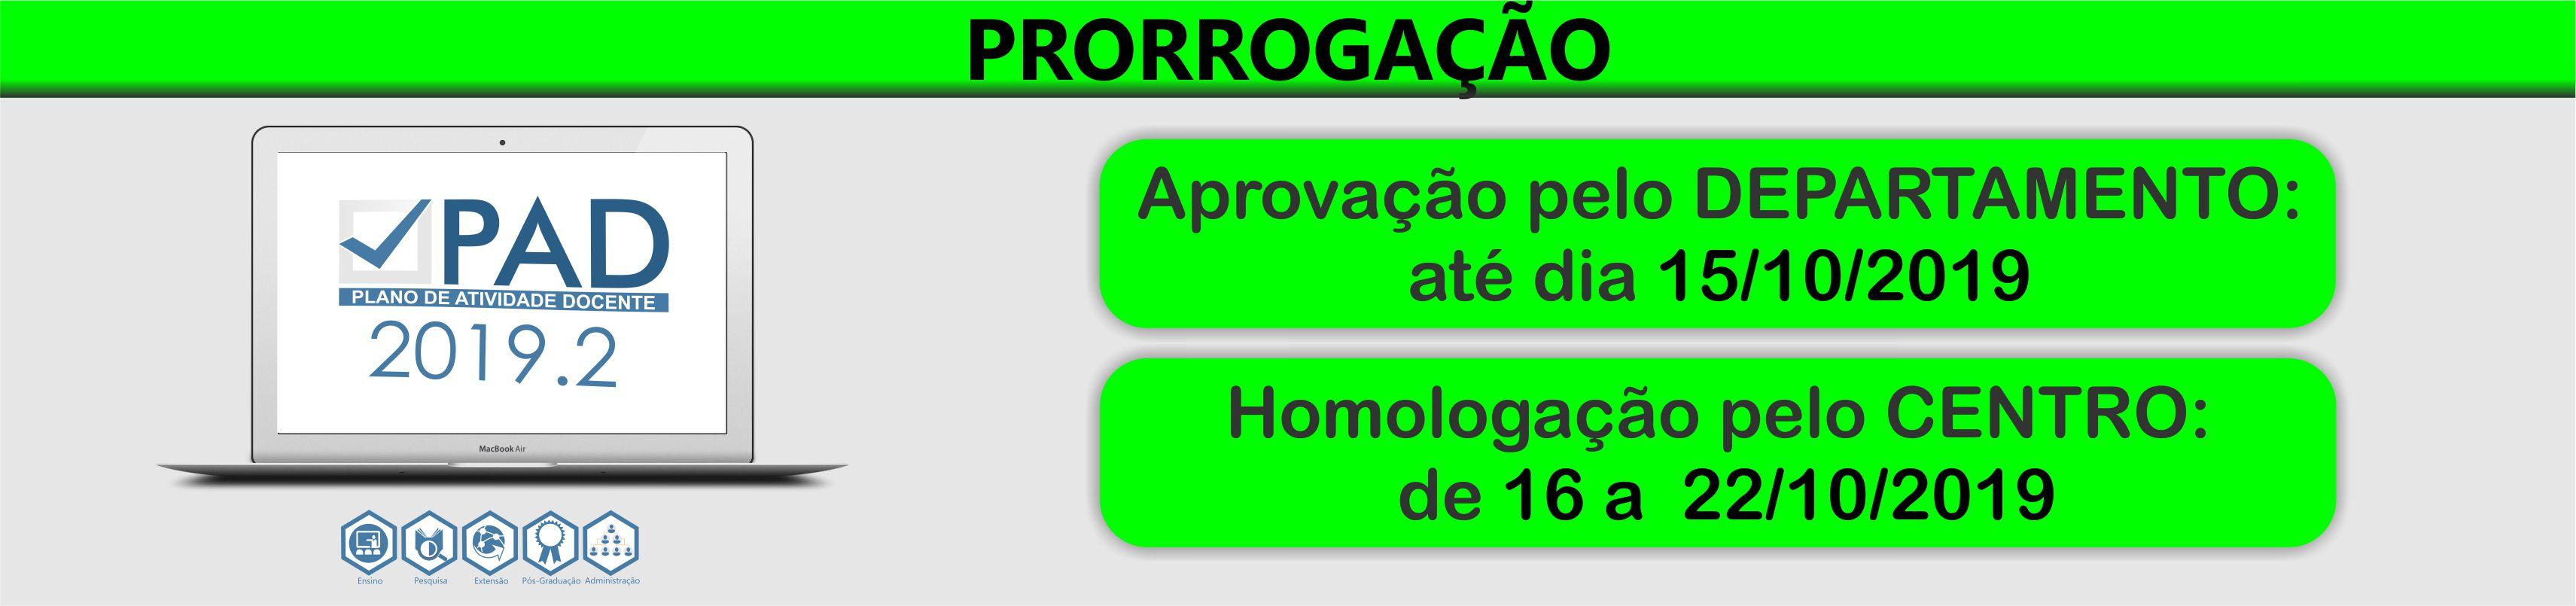 PAD_2019_2_prorrog_dia_professores